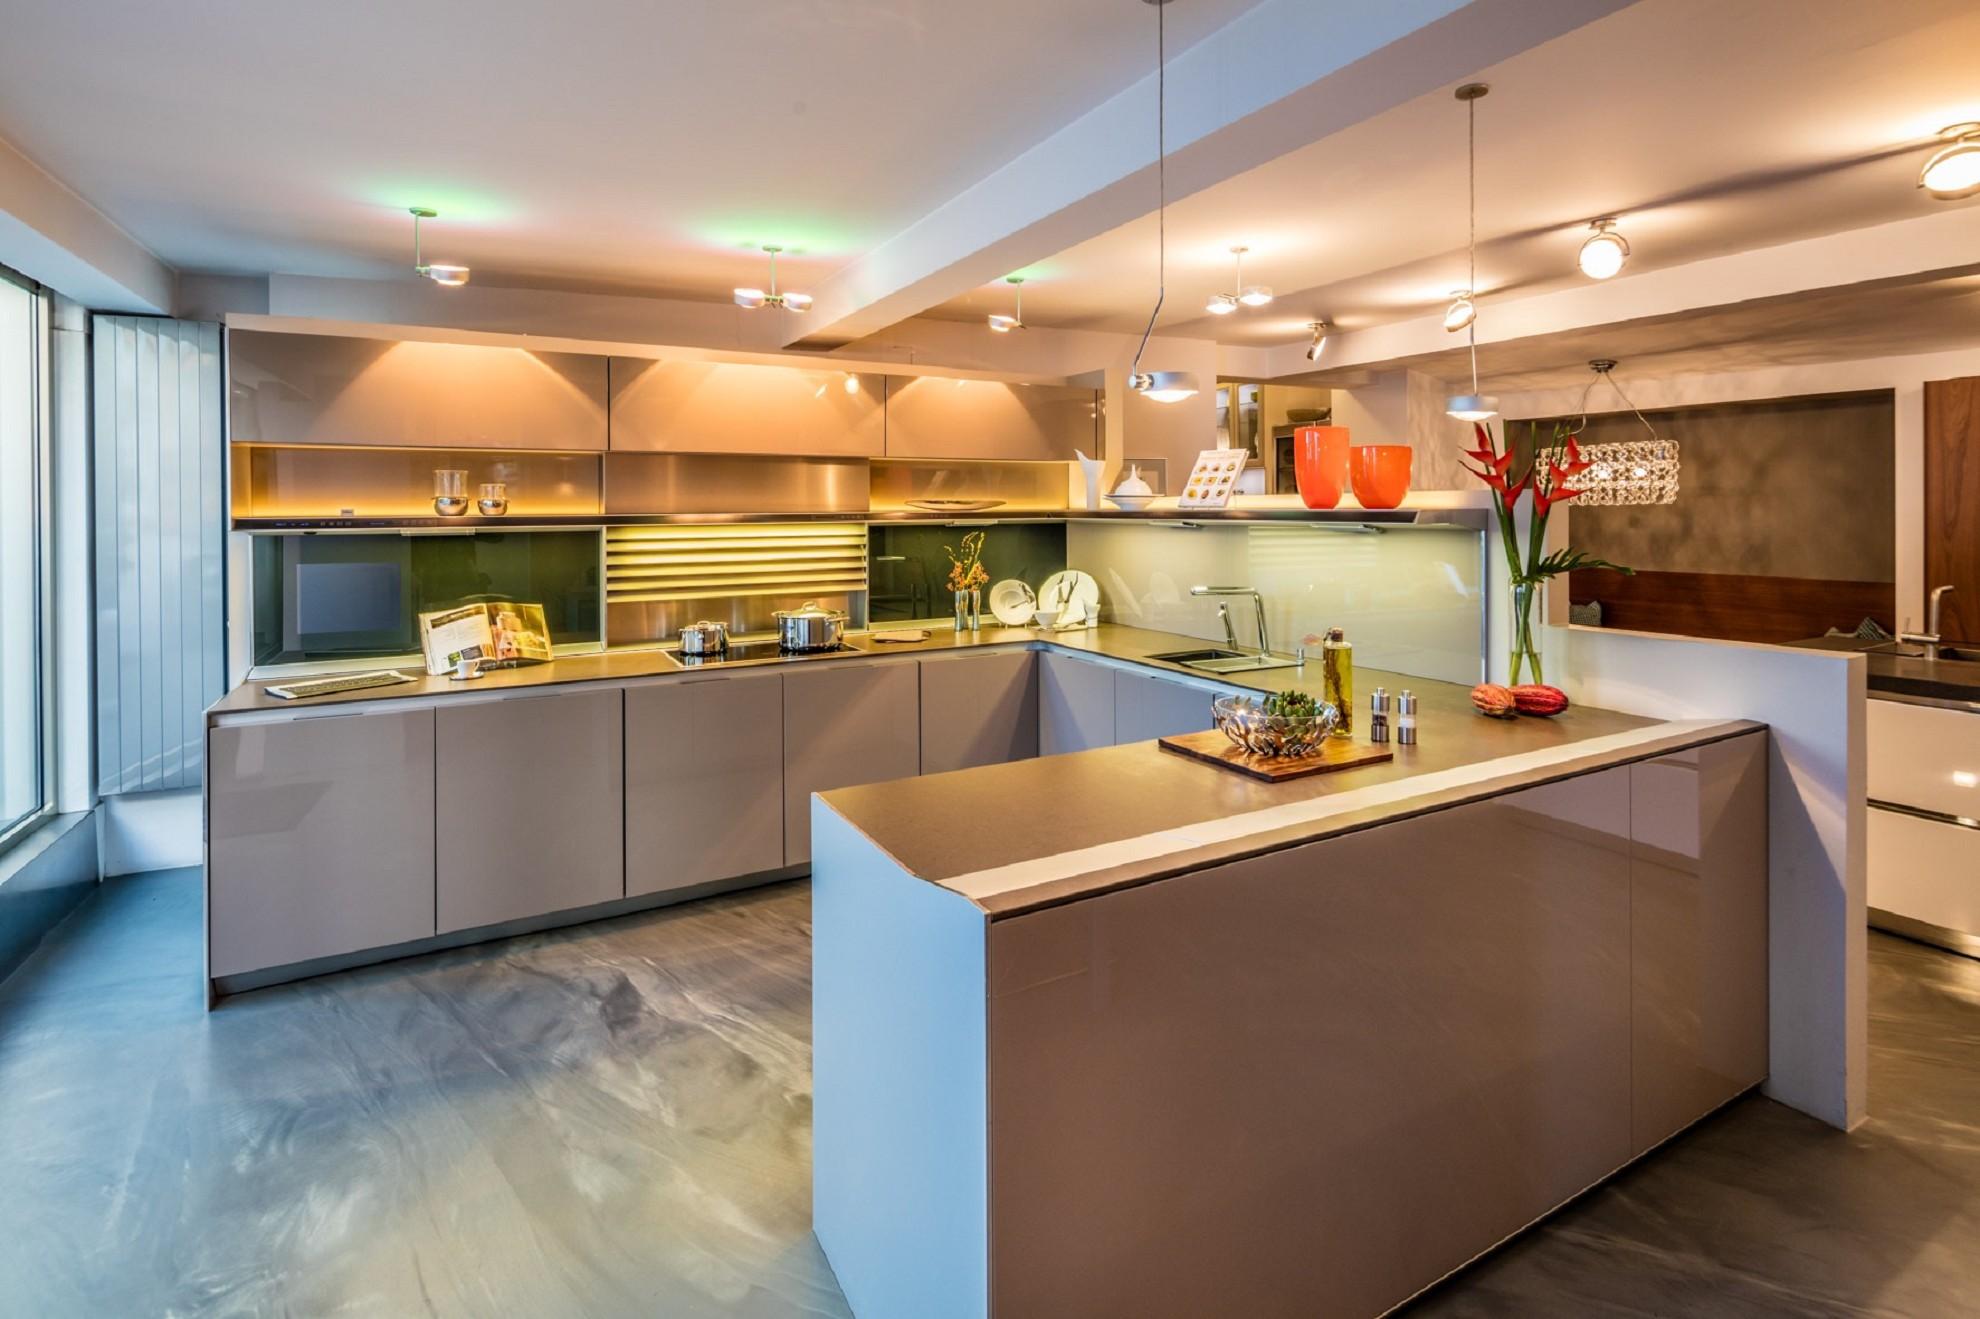 Küchenhaus Süd küchenhaus süd küchenstudio in frankfurt siematic com